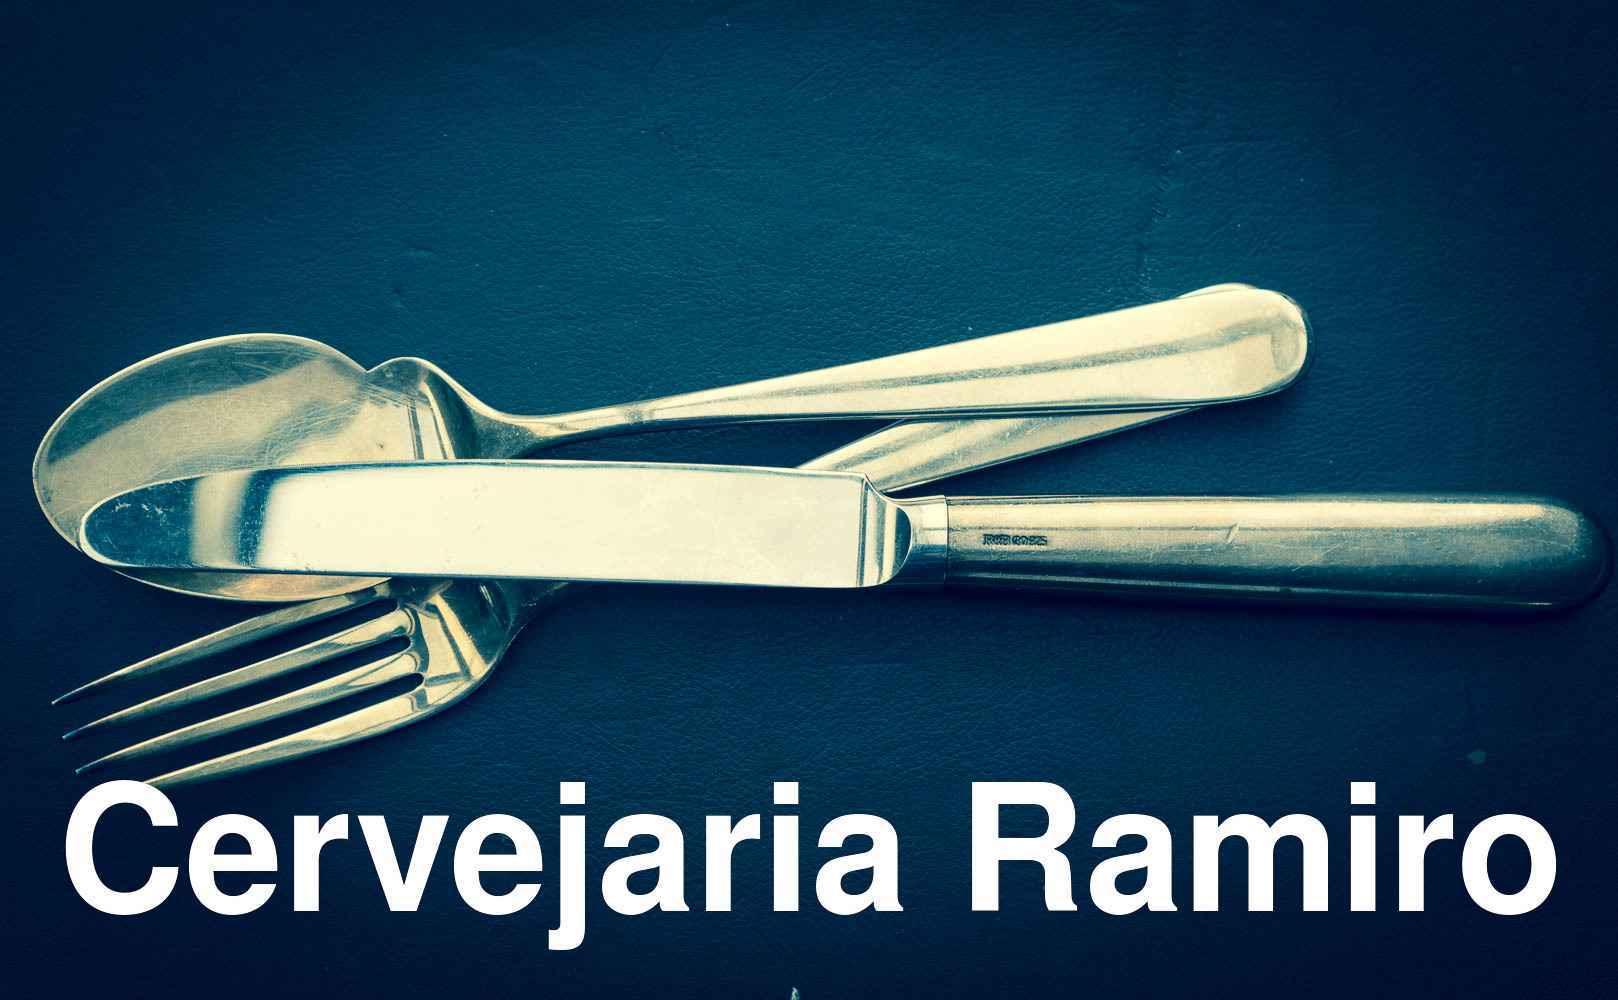 Restaurantkritik: Cervejaria Ramiro in Avenida Almirante Reis 1-H, 1150-007 Lissabon, Portugal